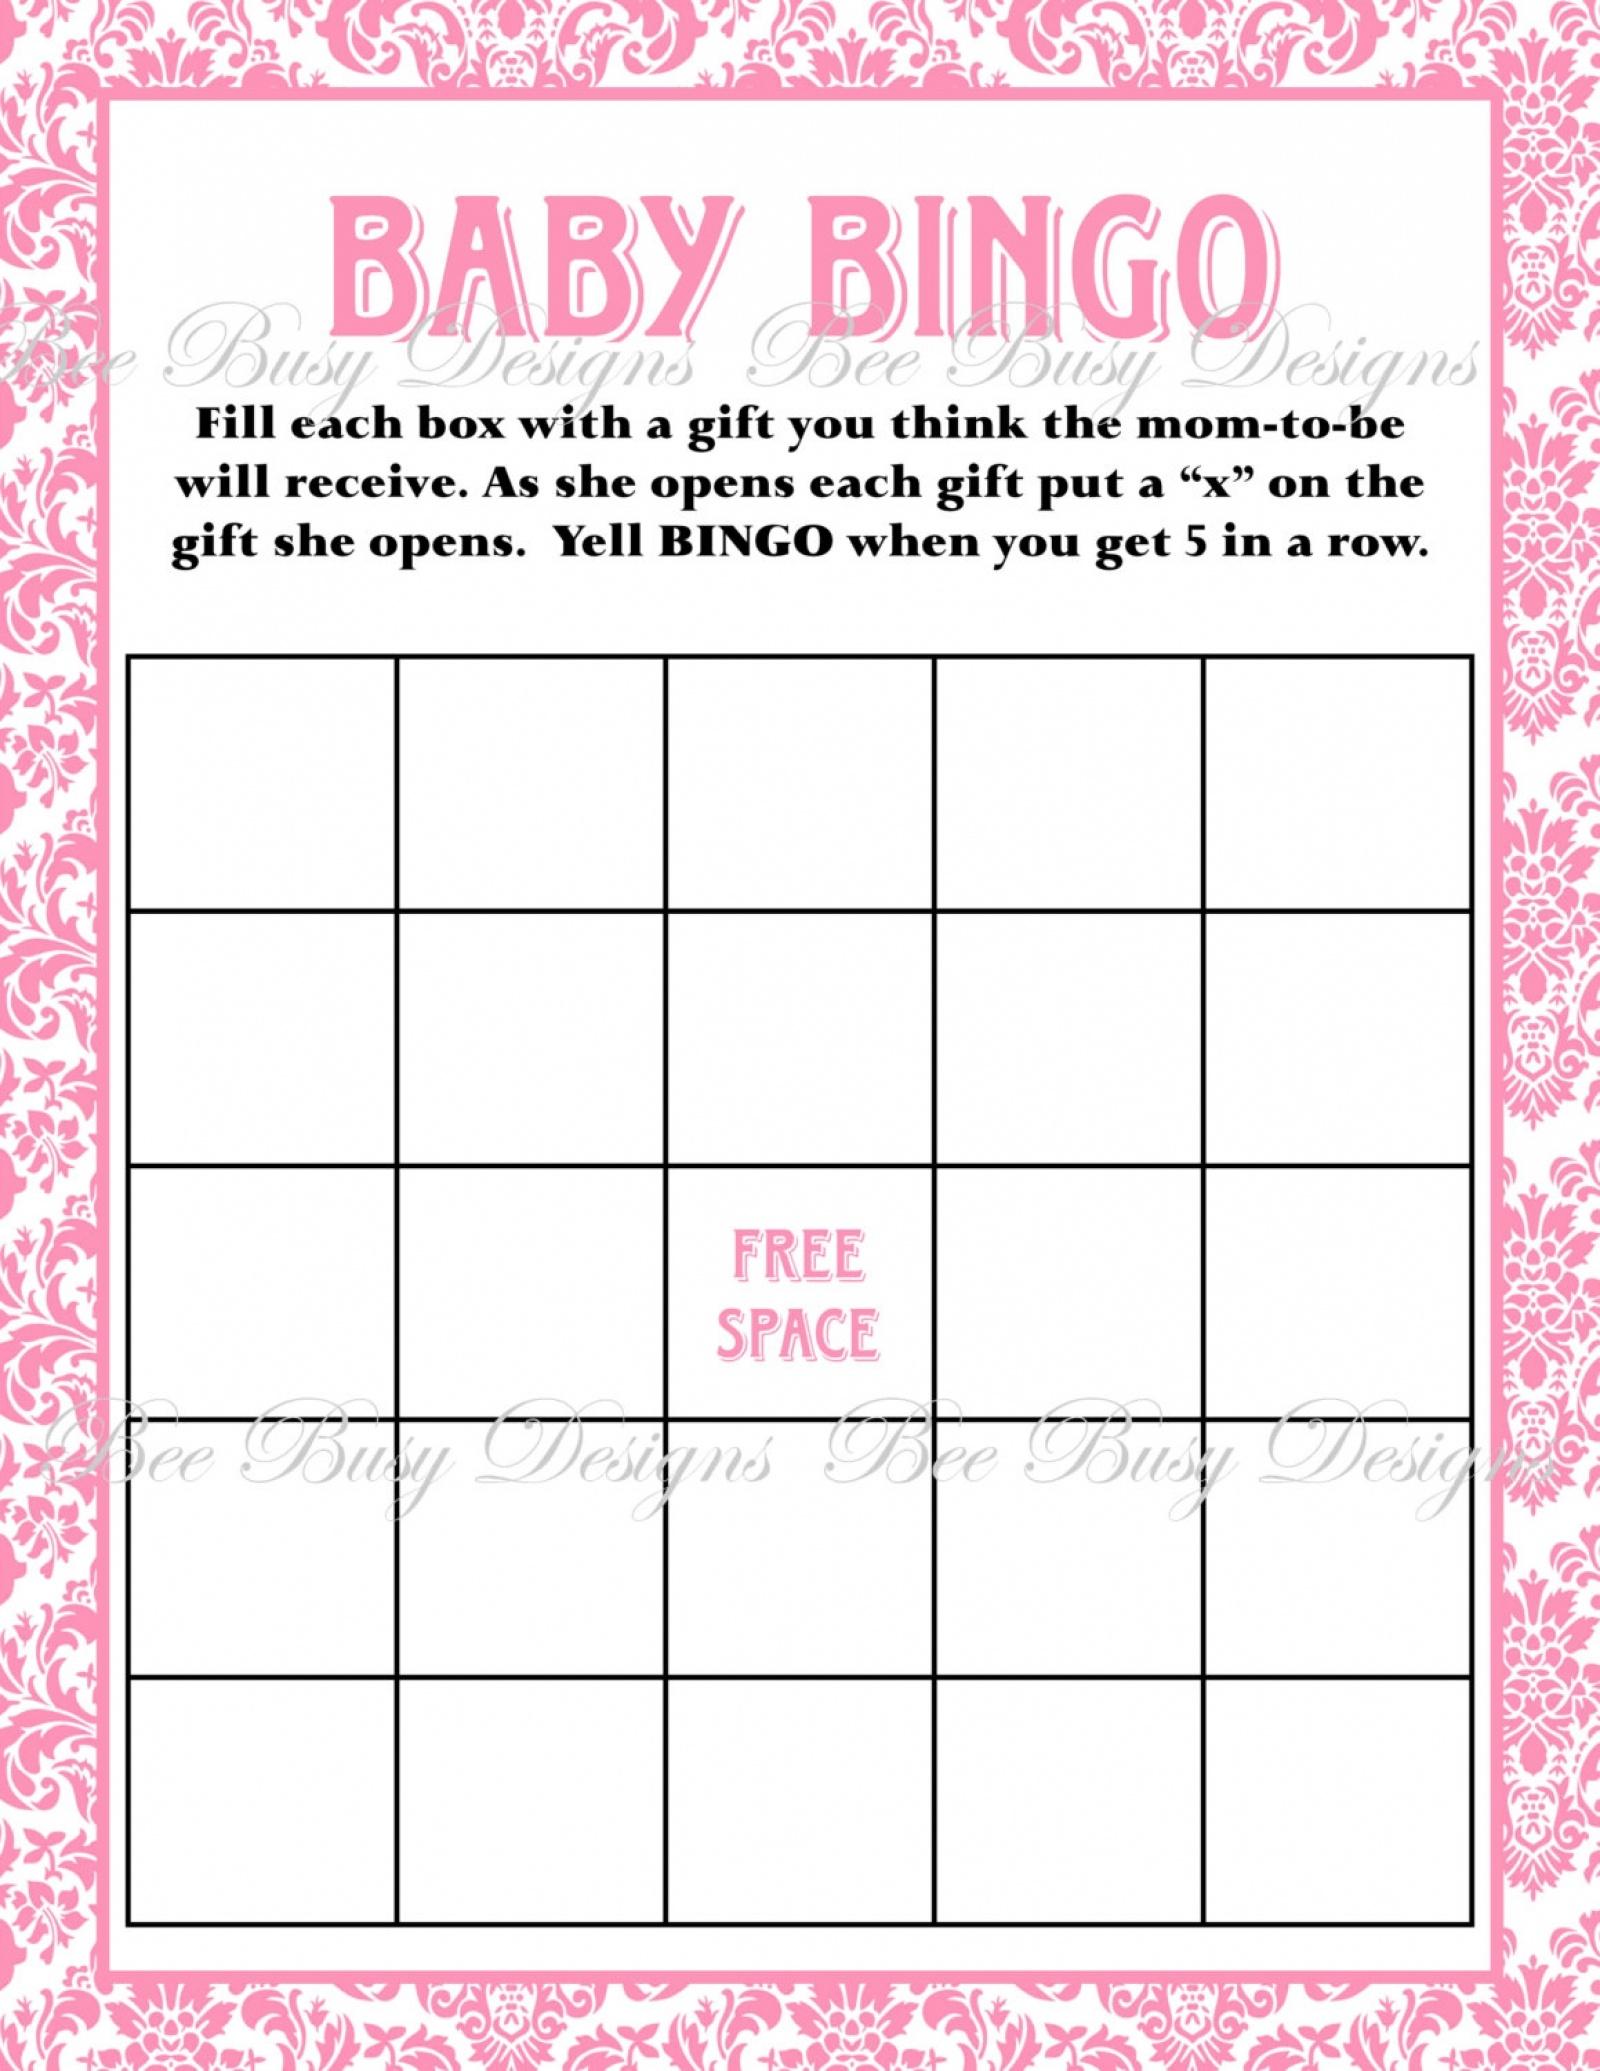 Printable Pink Damask Baby Shower Bingo Game Instant Download | Bee - Baby Bingo Game Free Printable